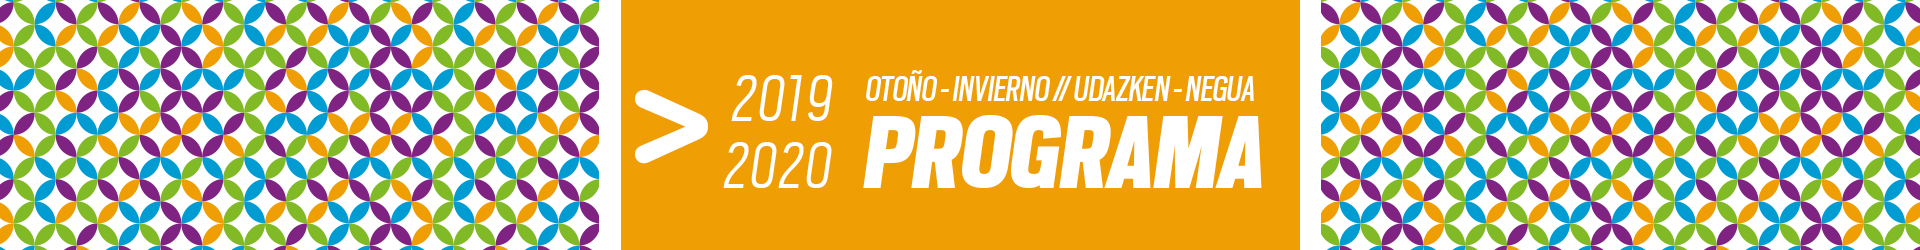 banner-factoriadevalores-programa-19-20